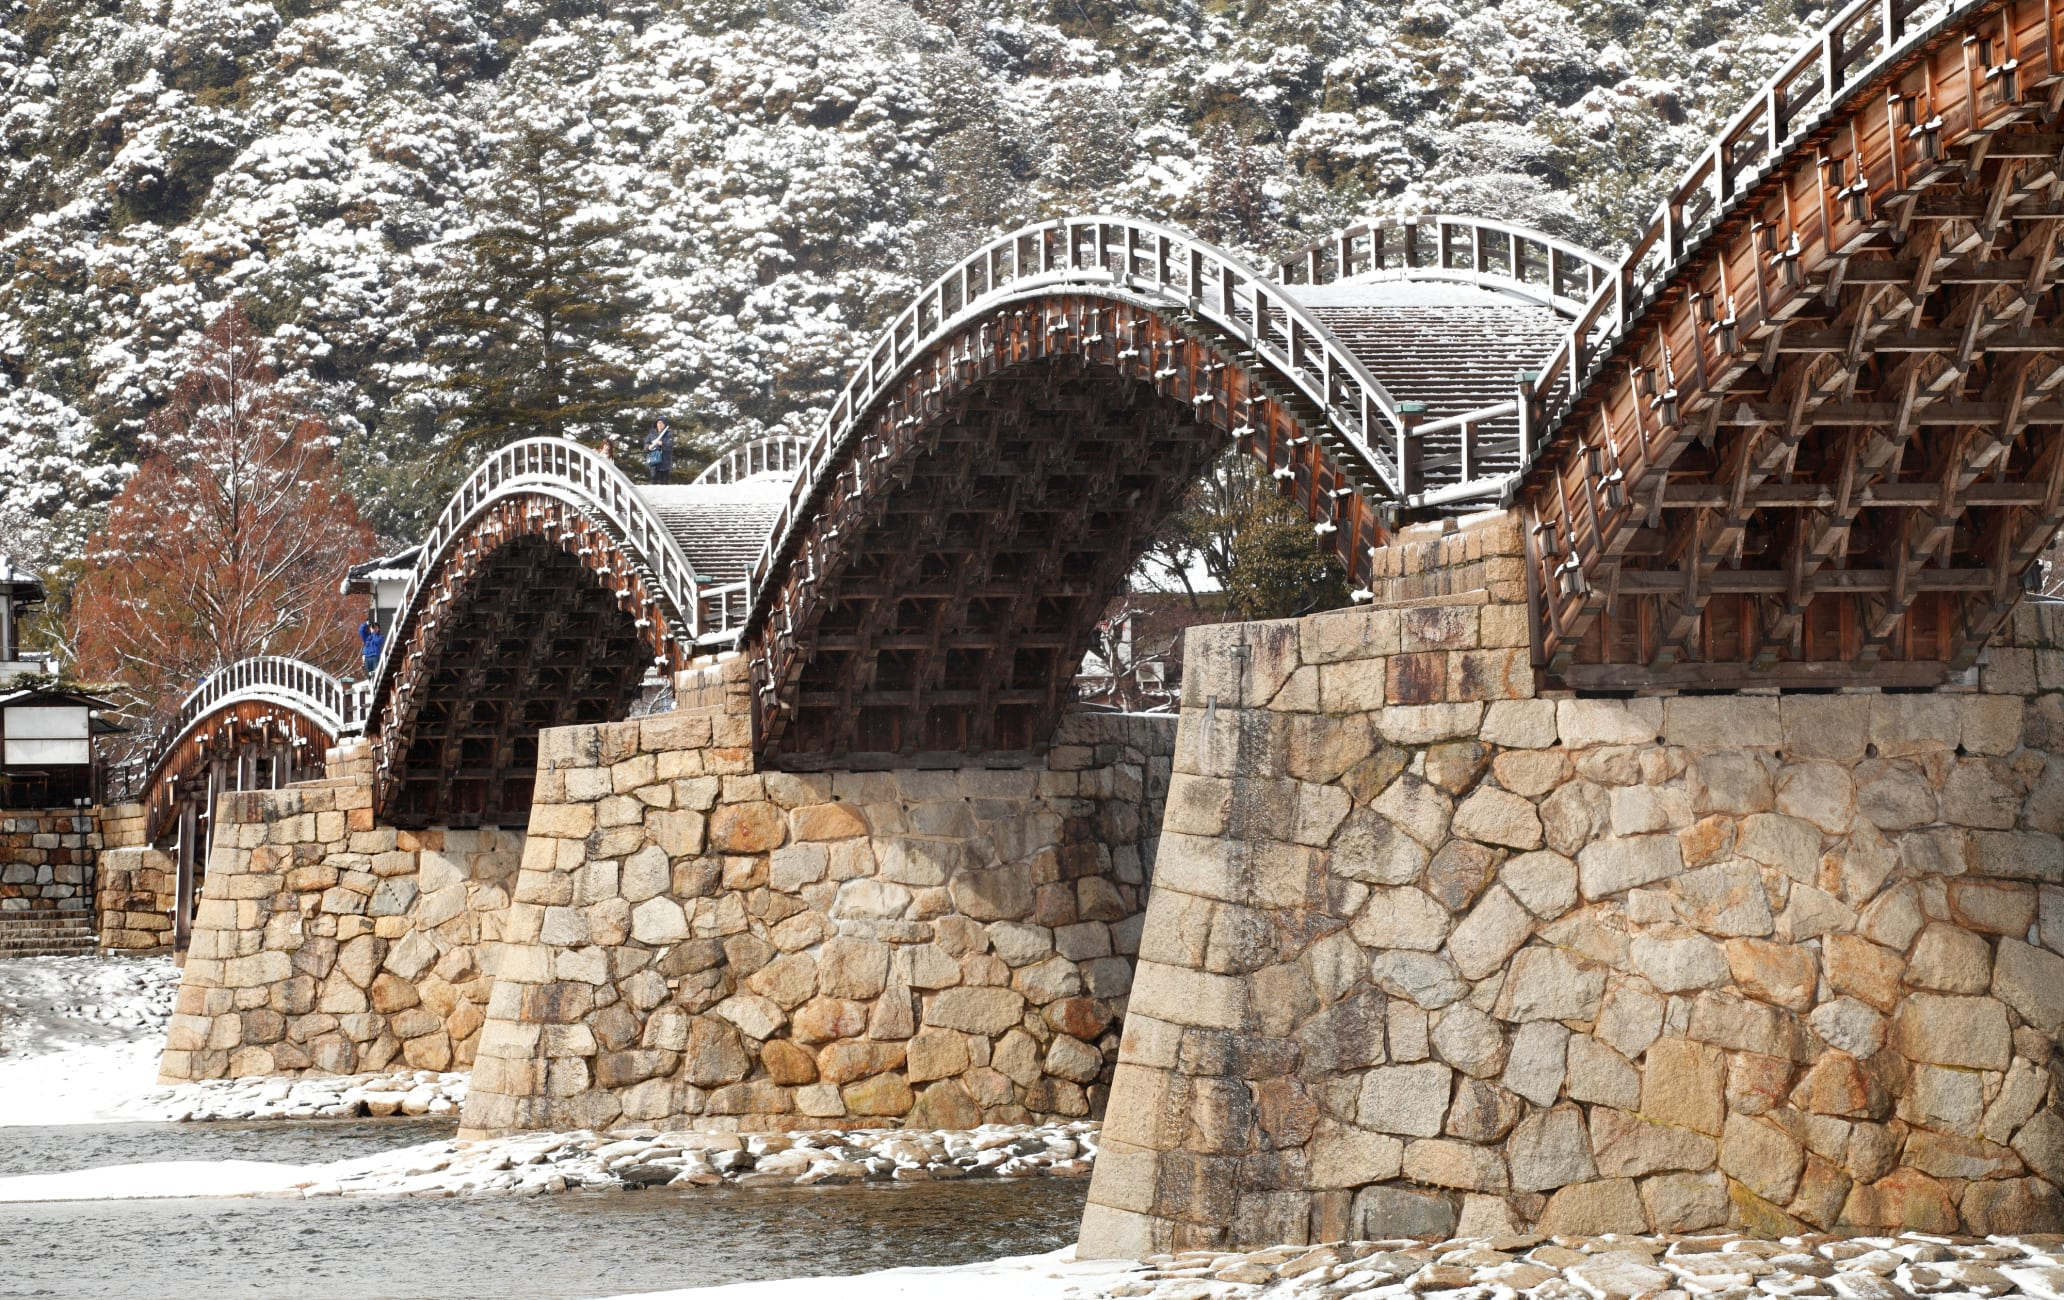 kintai-kyo bridge